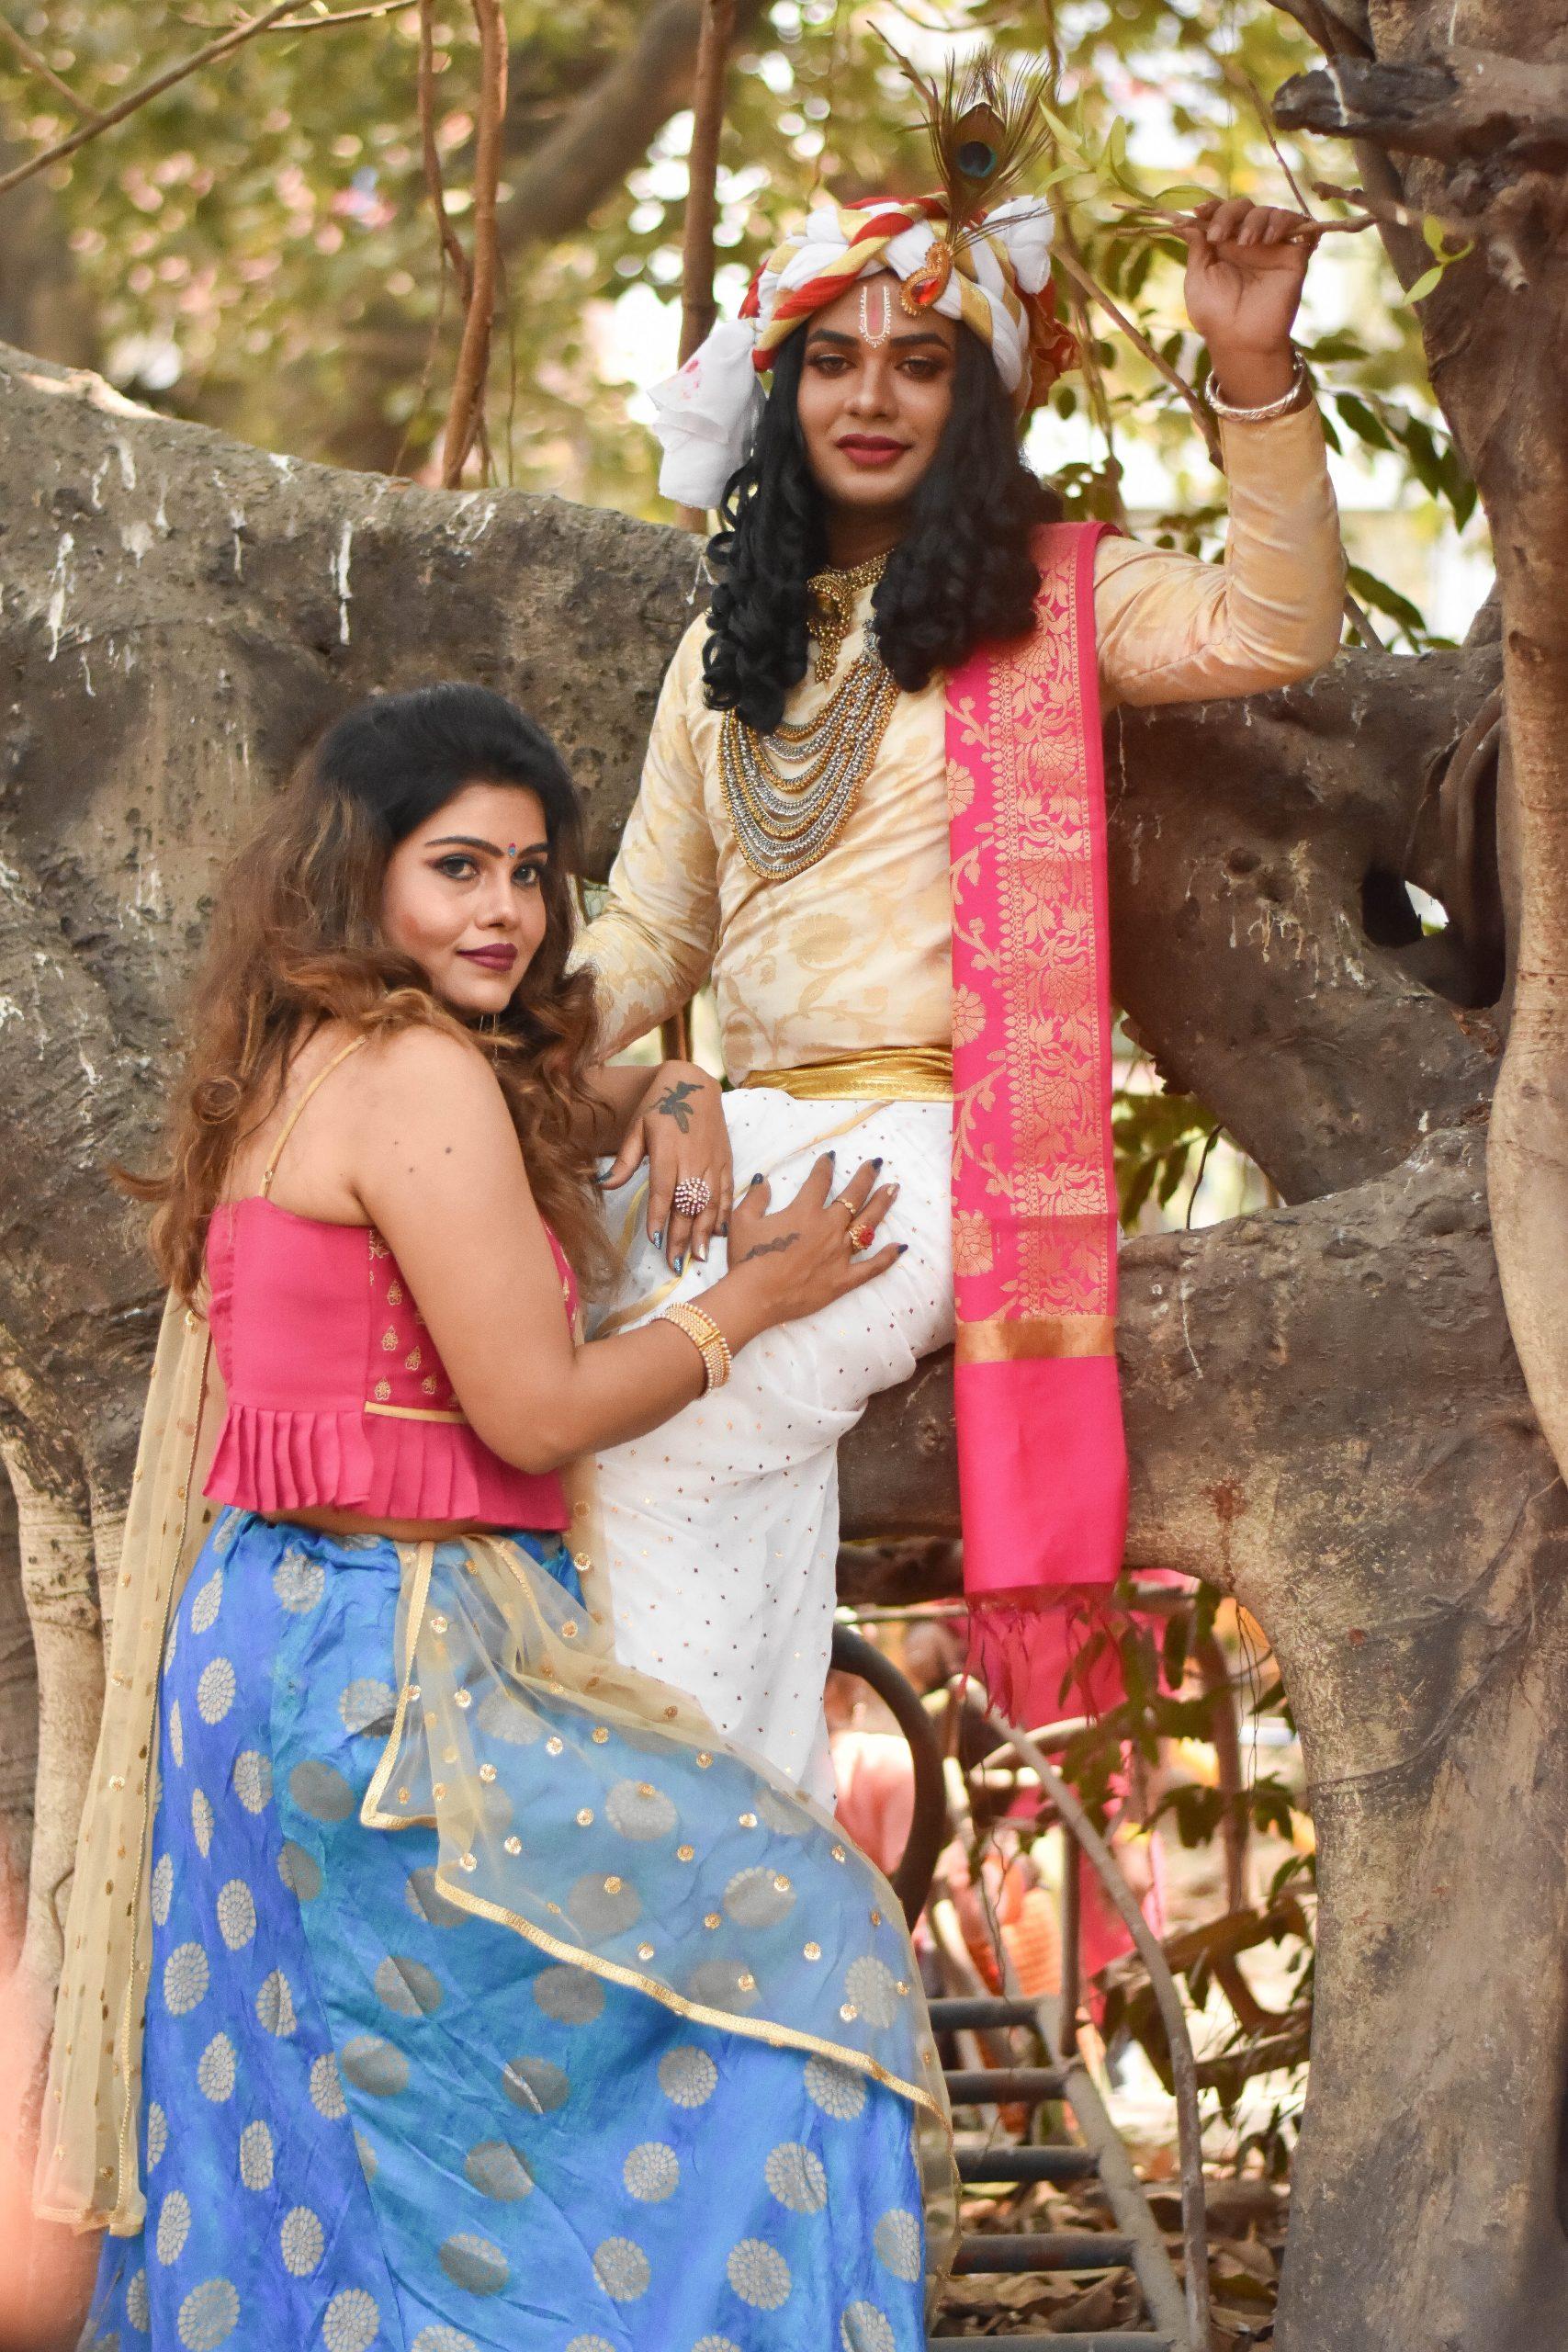 Girls in a Radha-Krishna getup